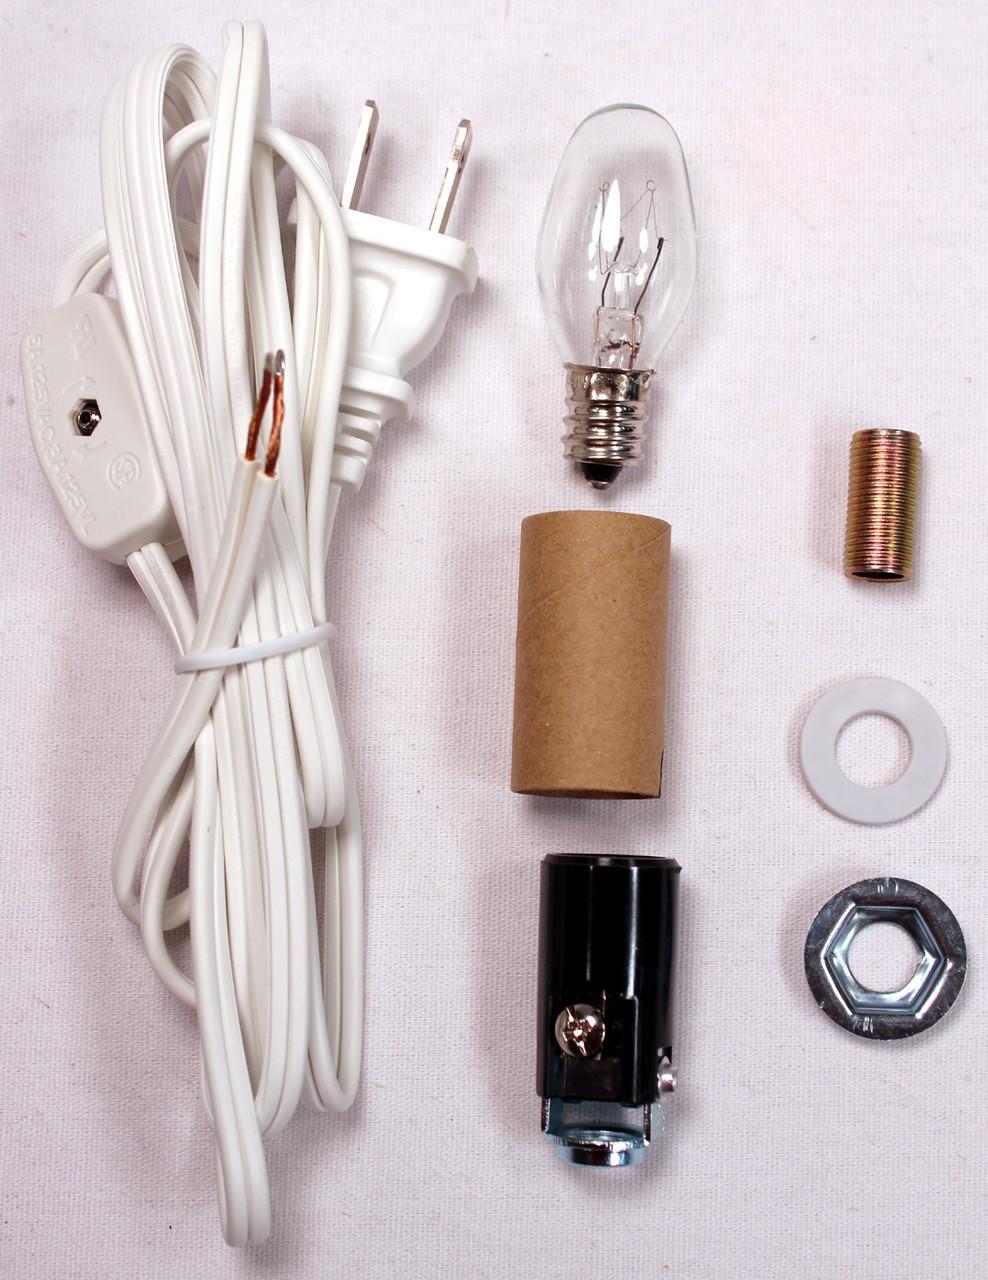 Wondrous Creative Hobbies Small Christmas Tree Wiring Kit Ml2 B6 Great For Wiring Digital Resources Remcakbiperorg